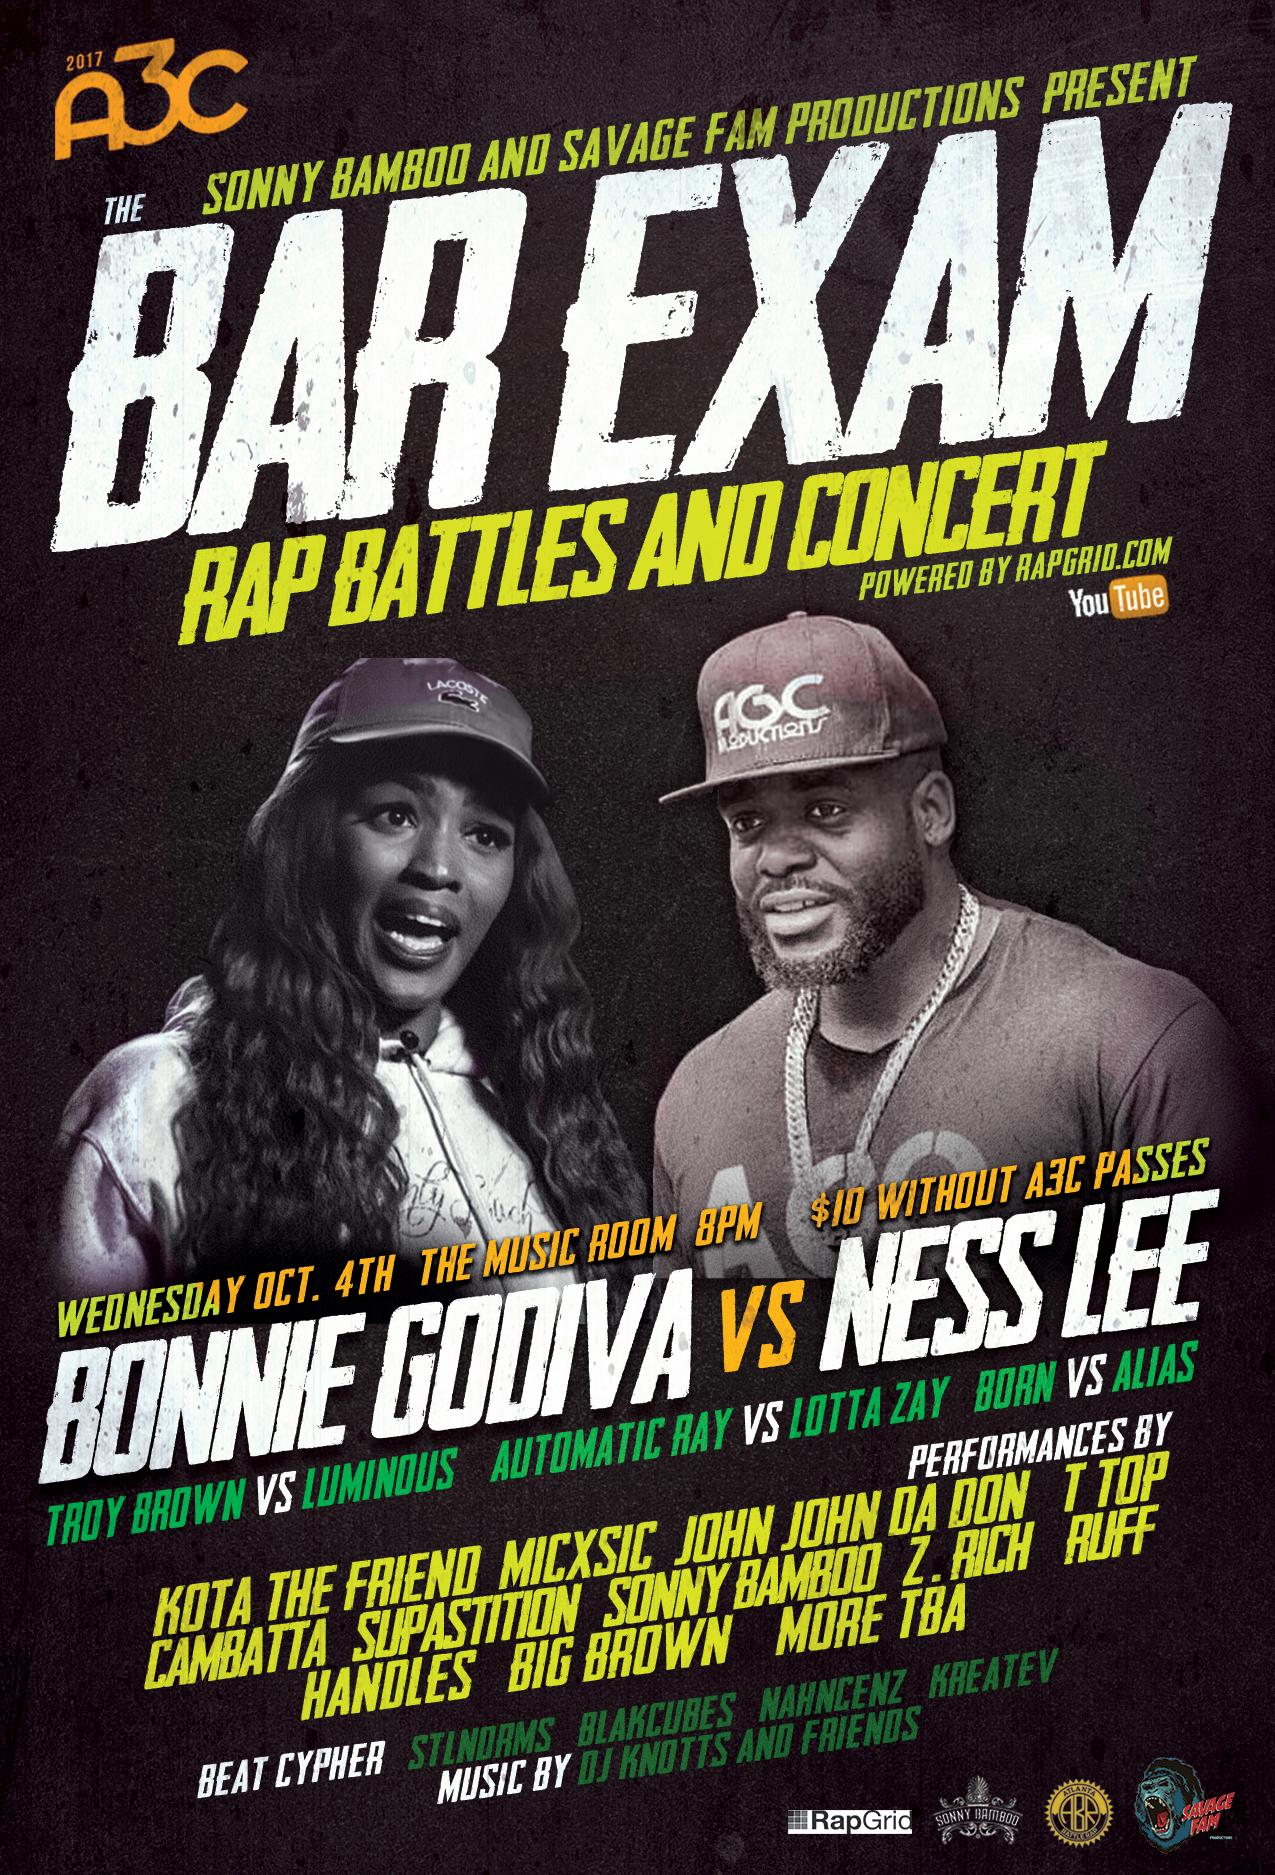 Rap Battle Bar Exam - A3C 2017 Flyer.png